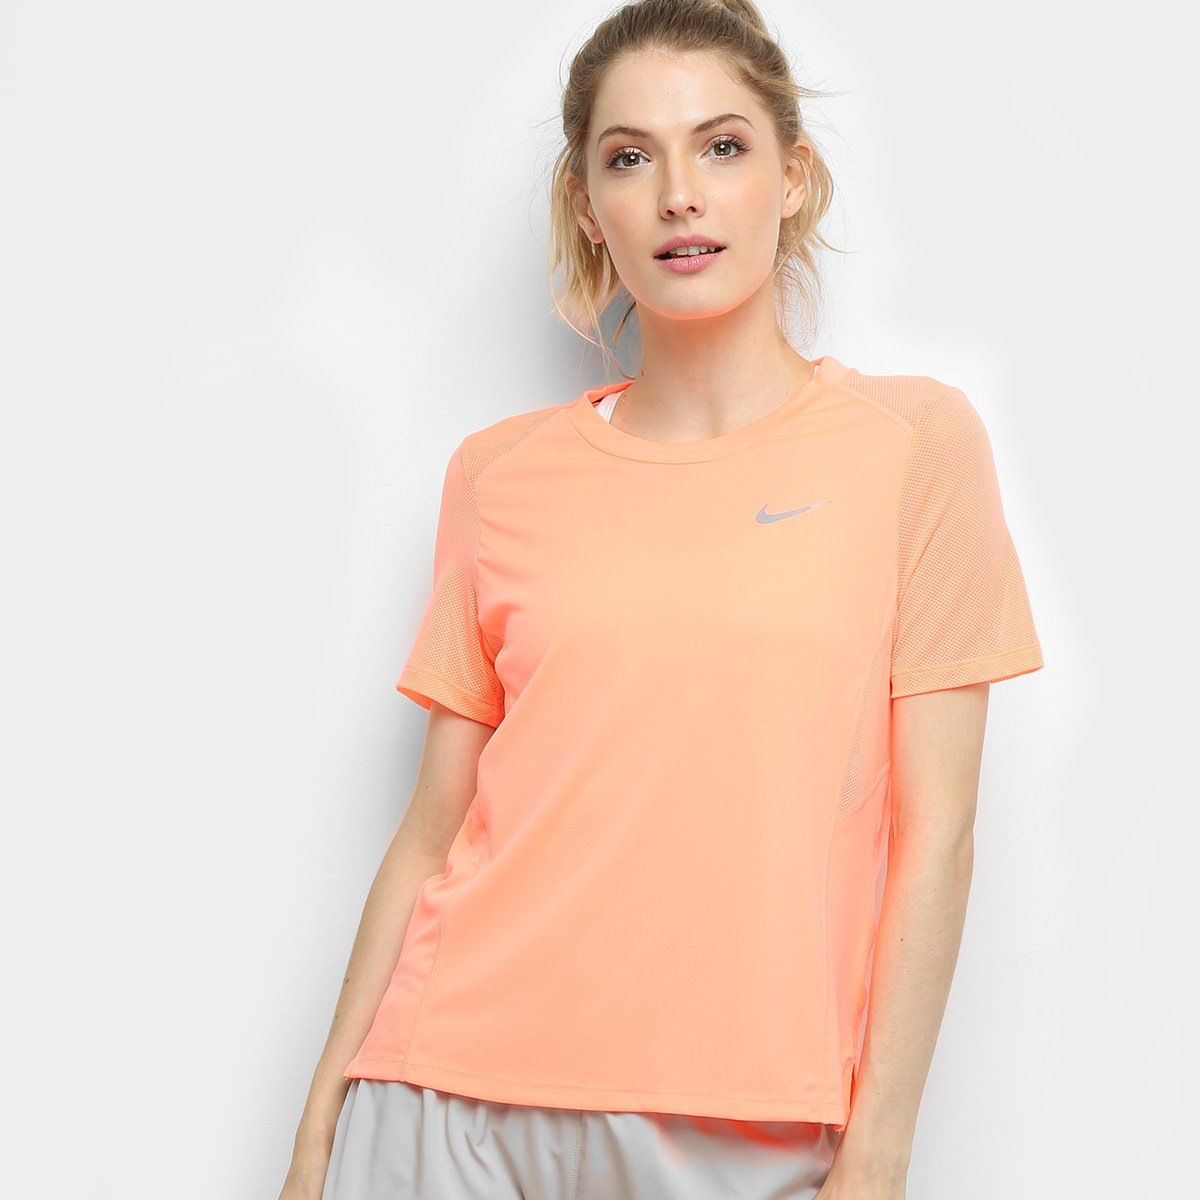 Netshoes Agora Ss Miler Camiseta E Feminina Compre Coral Nike Azul HnPwqAp7